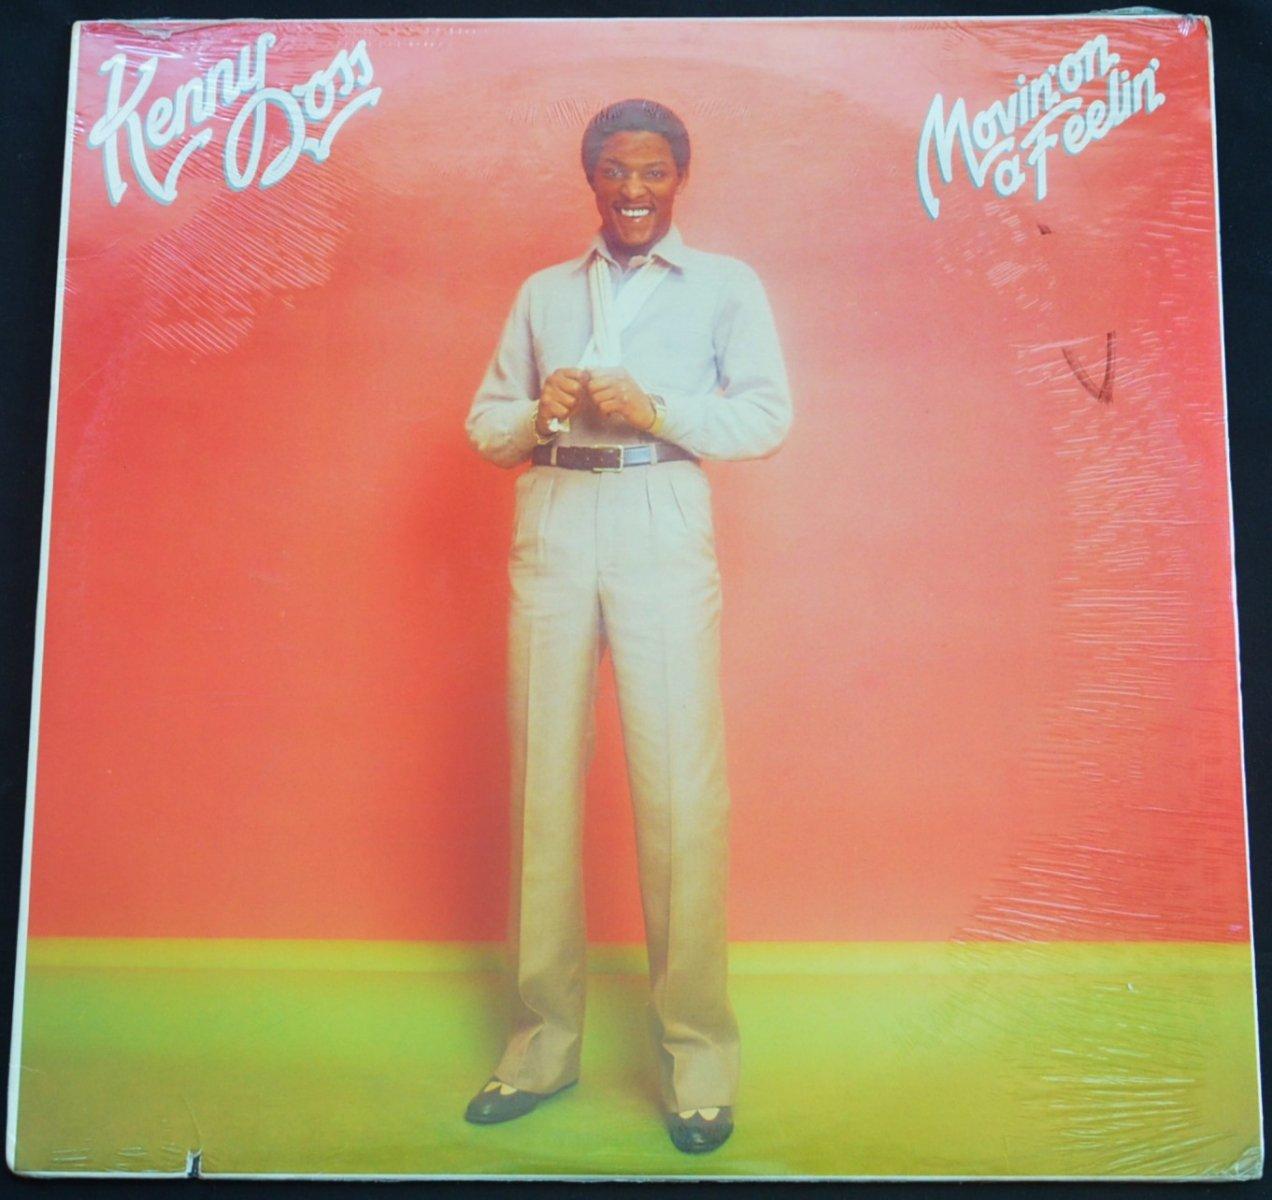 KENNY DOSS / MOVIN' ON A FEELIN' (LP)